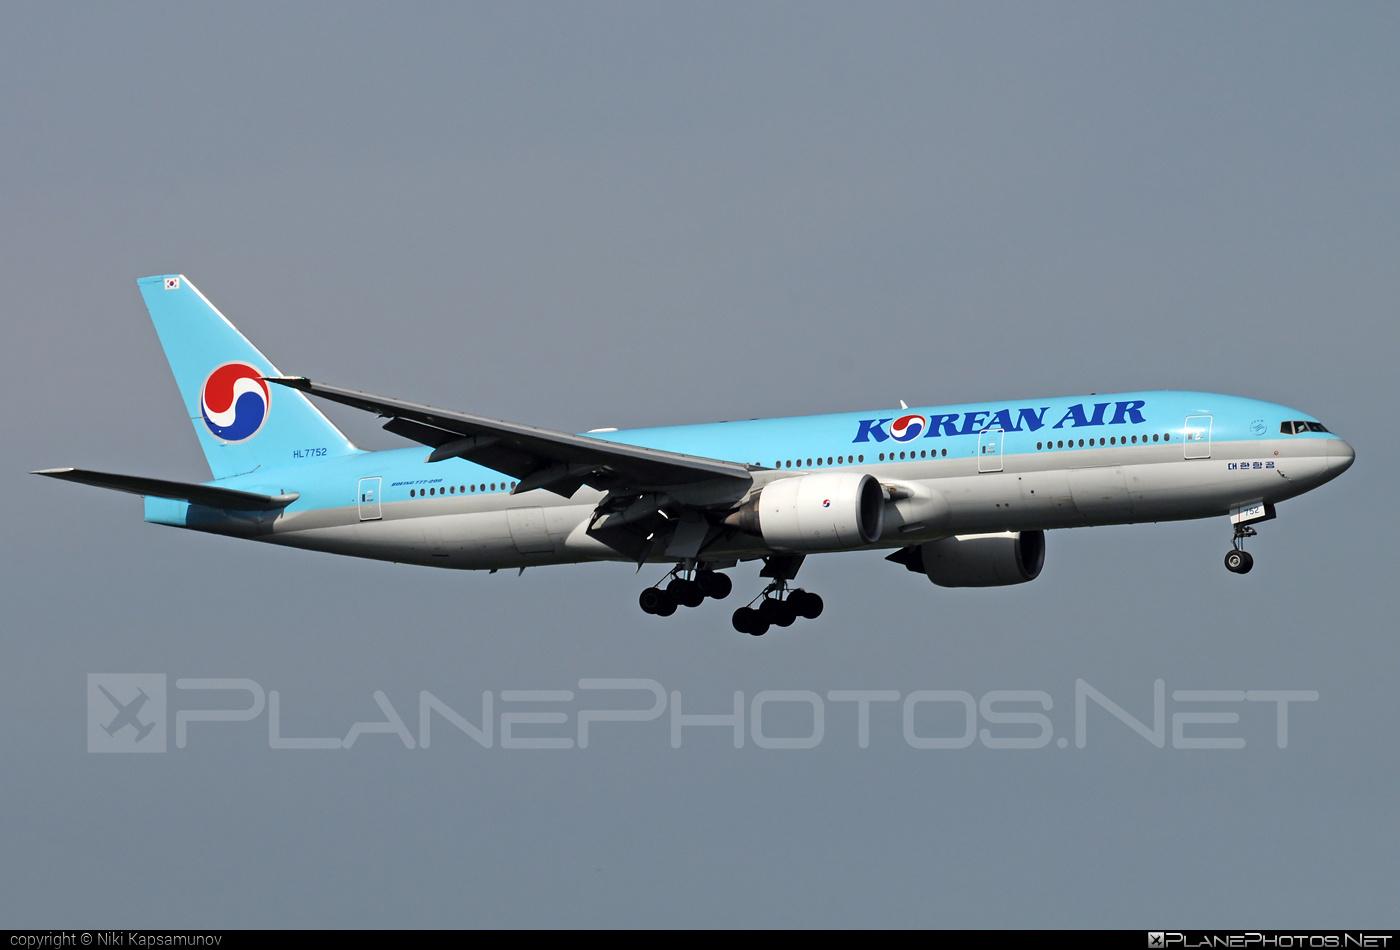 Boeing 777-200ER - HL7752 operated by Korean Air #b777 #b777er #boeing #boeing777 #koreanair #tripleseven